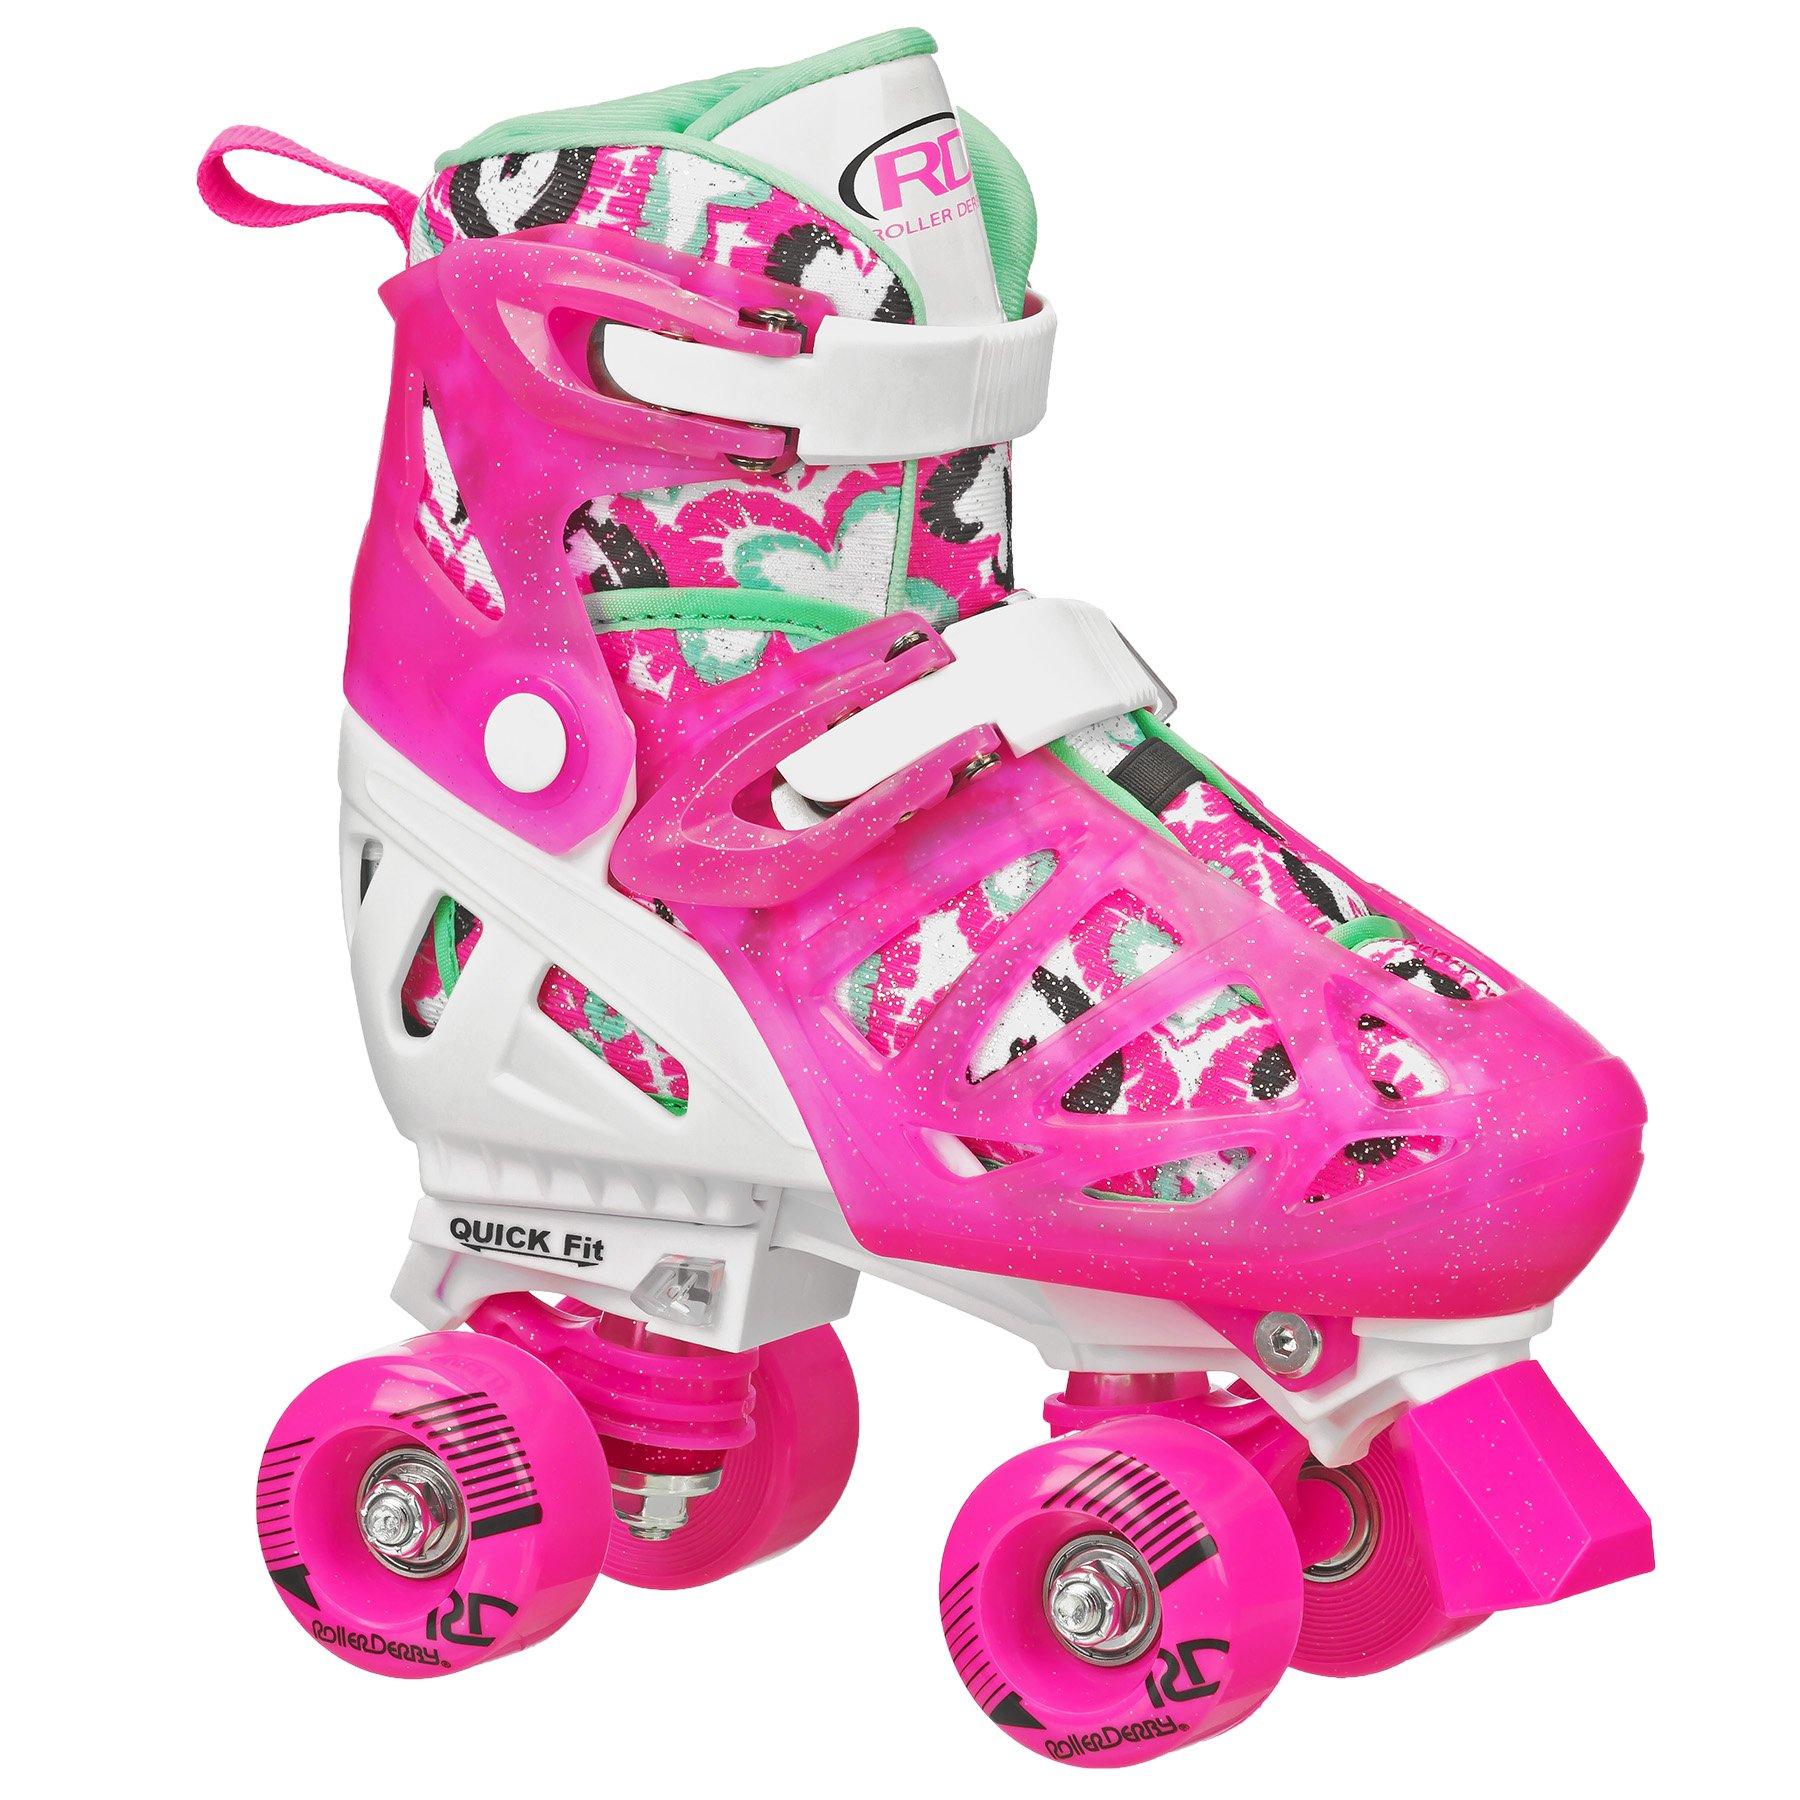 Roller Derby Girl's Fun Roll Adjustable Roller Skate, Medium by Roller Derby